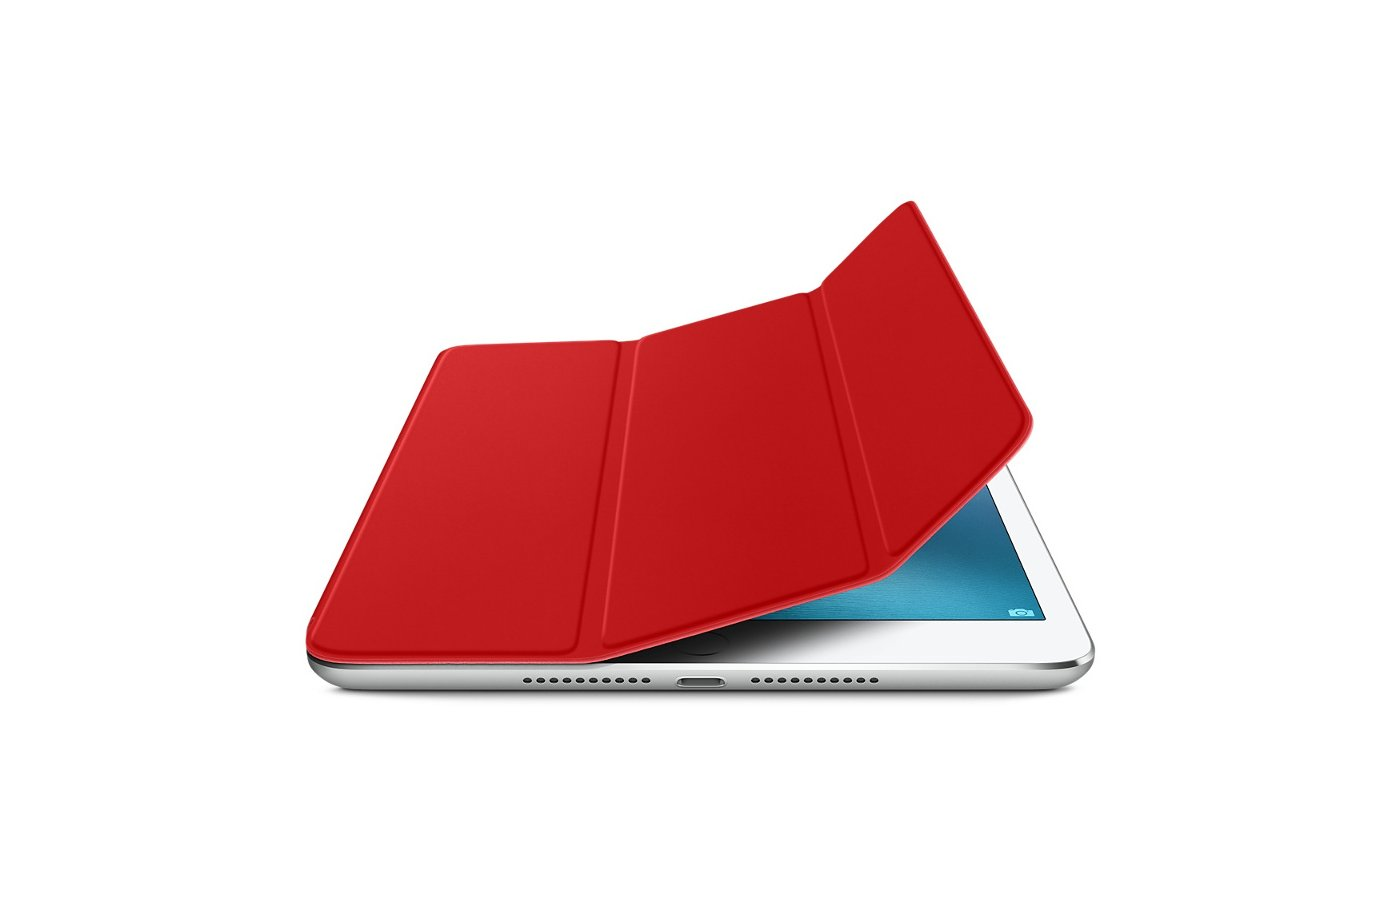 Чехол для планшетного ПК Apple iPad mini 4 Smart Cover -(PRODUCT)RED (MKLY2ZM/A)